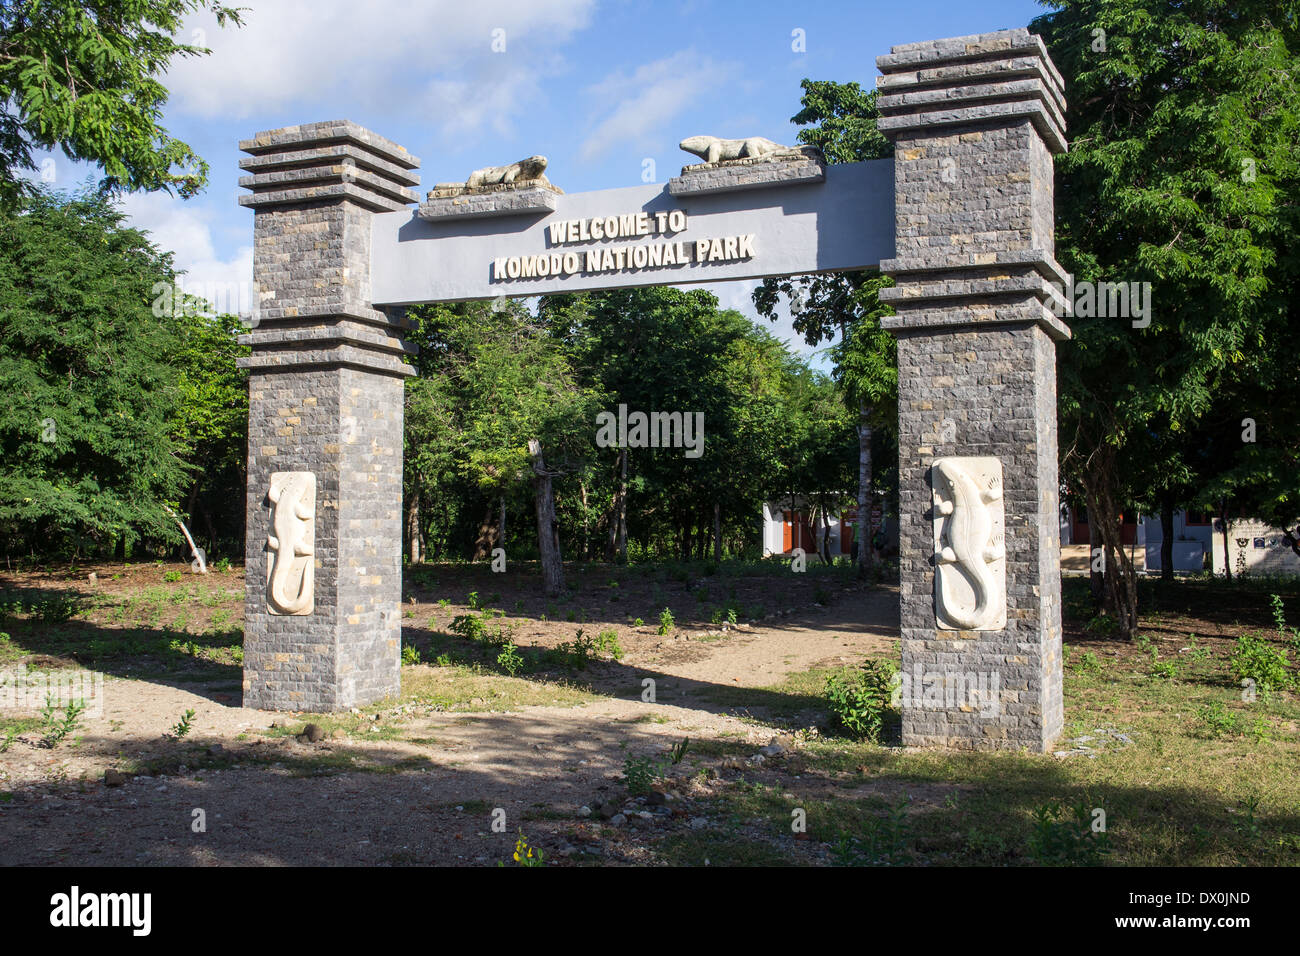 Entrance, Komodo National Park, UNESCO World Heritage Site, Komodo, Indonesia, Southeast Asia Stock Photo